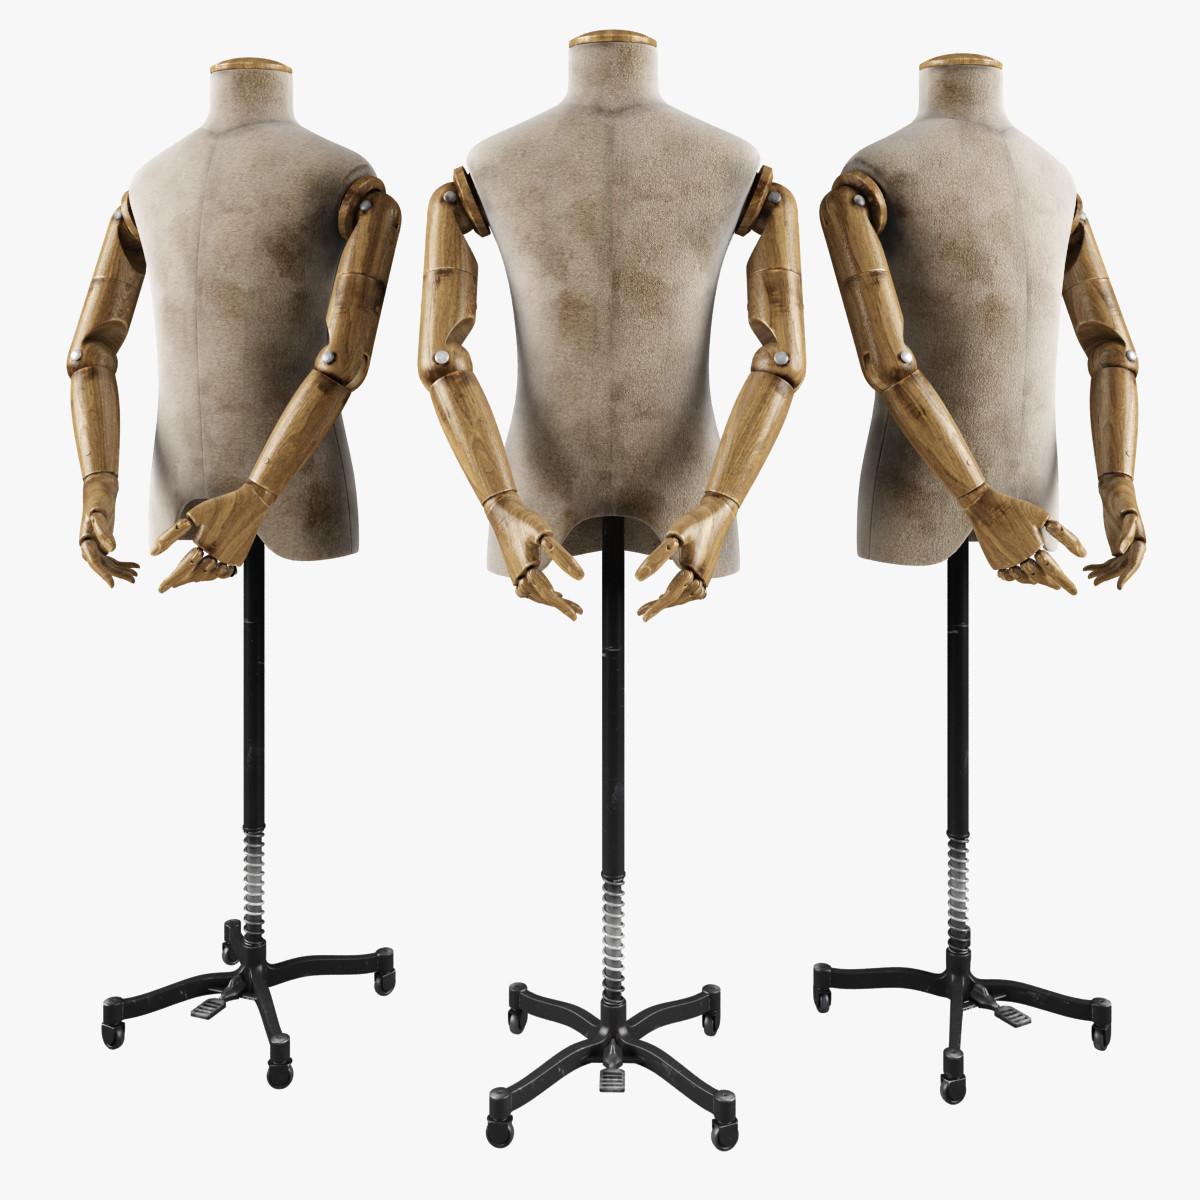 Sewing_mannequin_male_v001_001.jpg